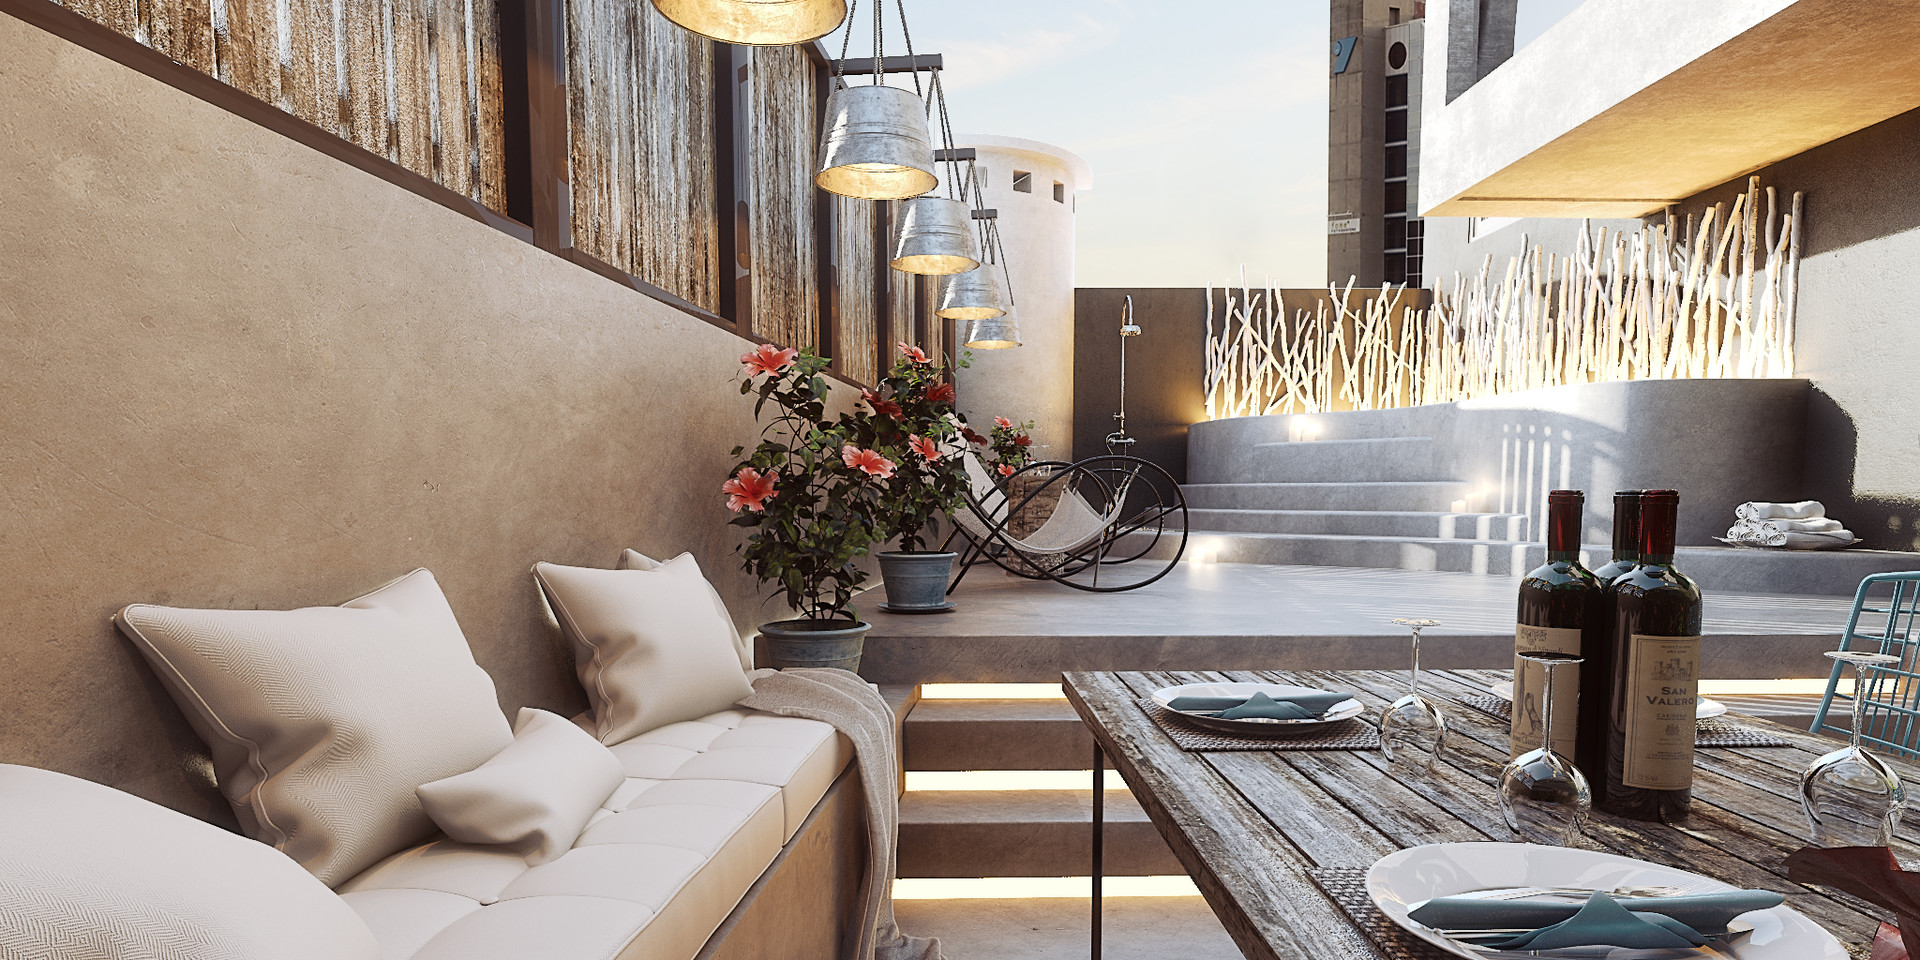 Artstation iviskos terrace 3d visualization george for Boutique hotel 5 rhodes